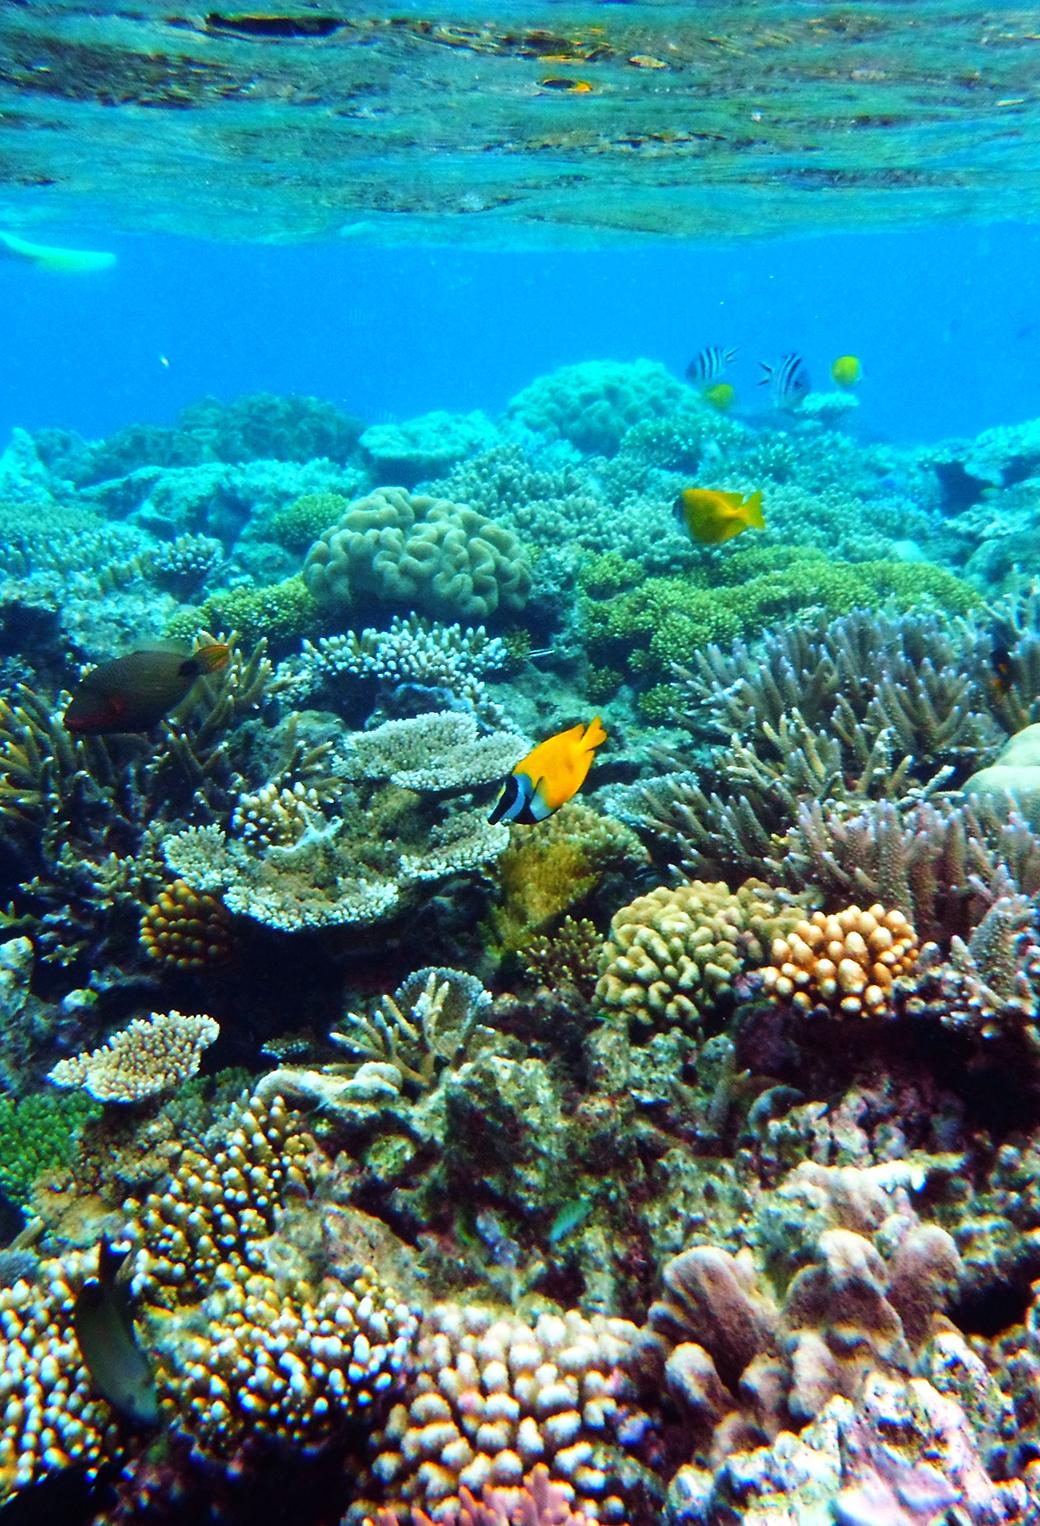 76 great barrier reef wallpaper on wallpapersafari - Great barrier reef desktop background ...